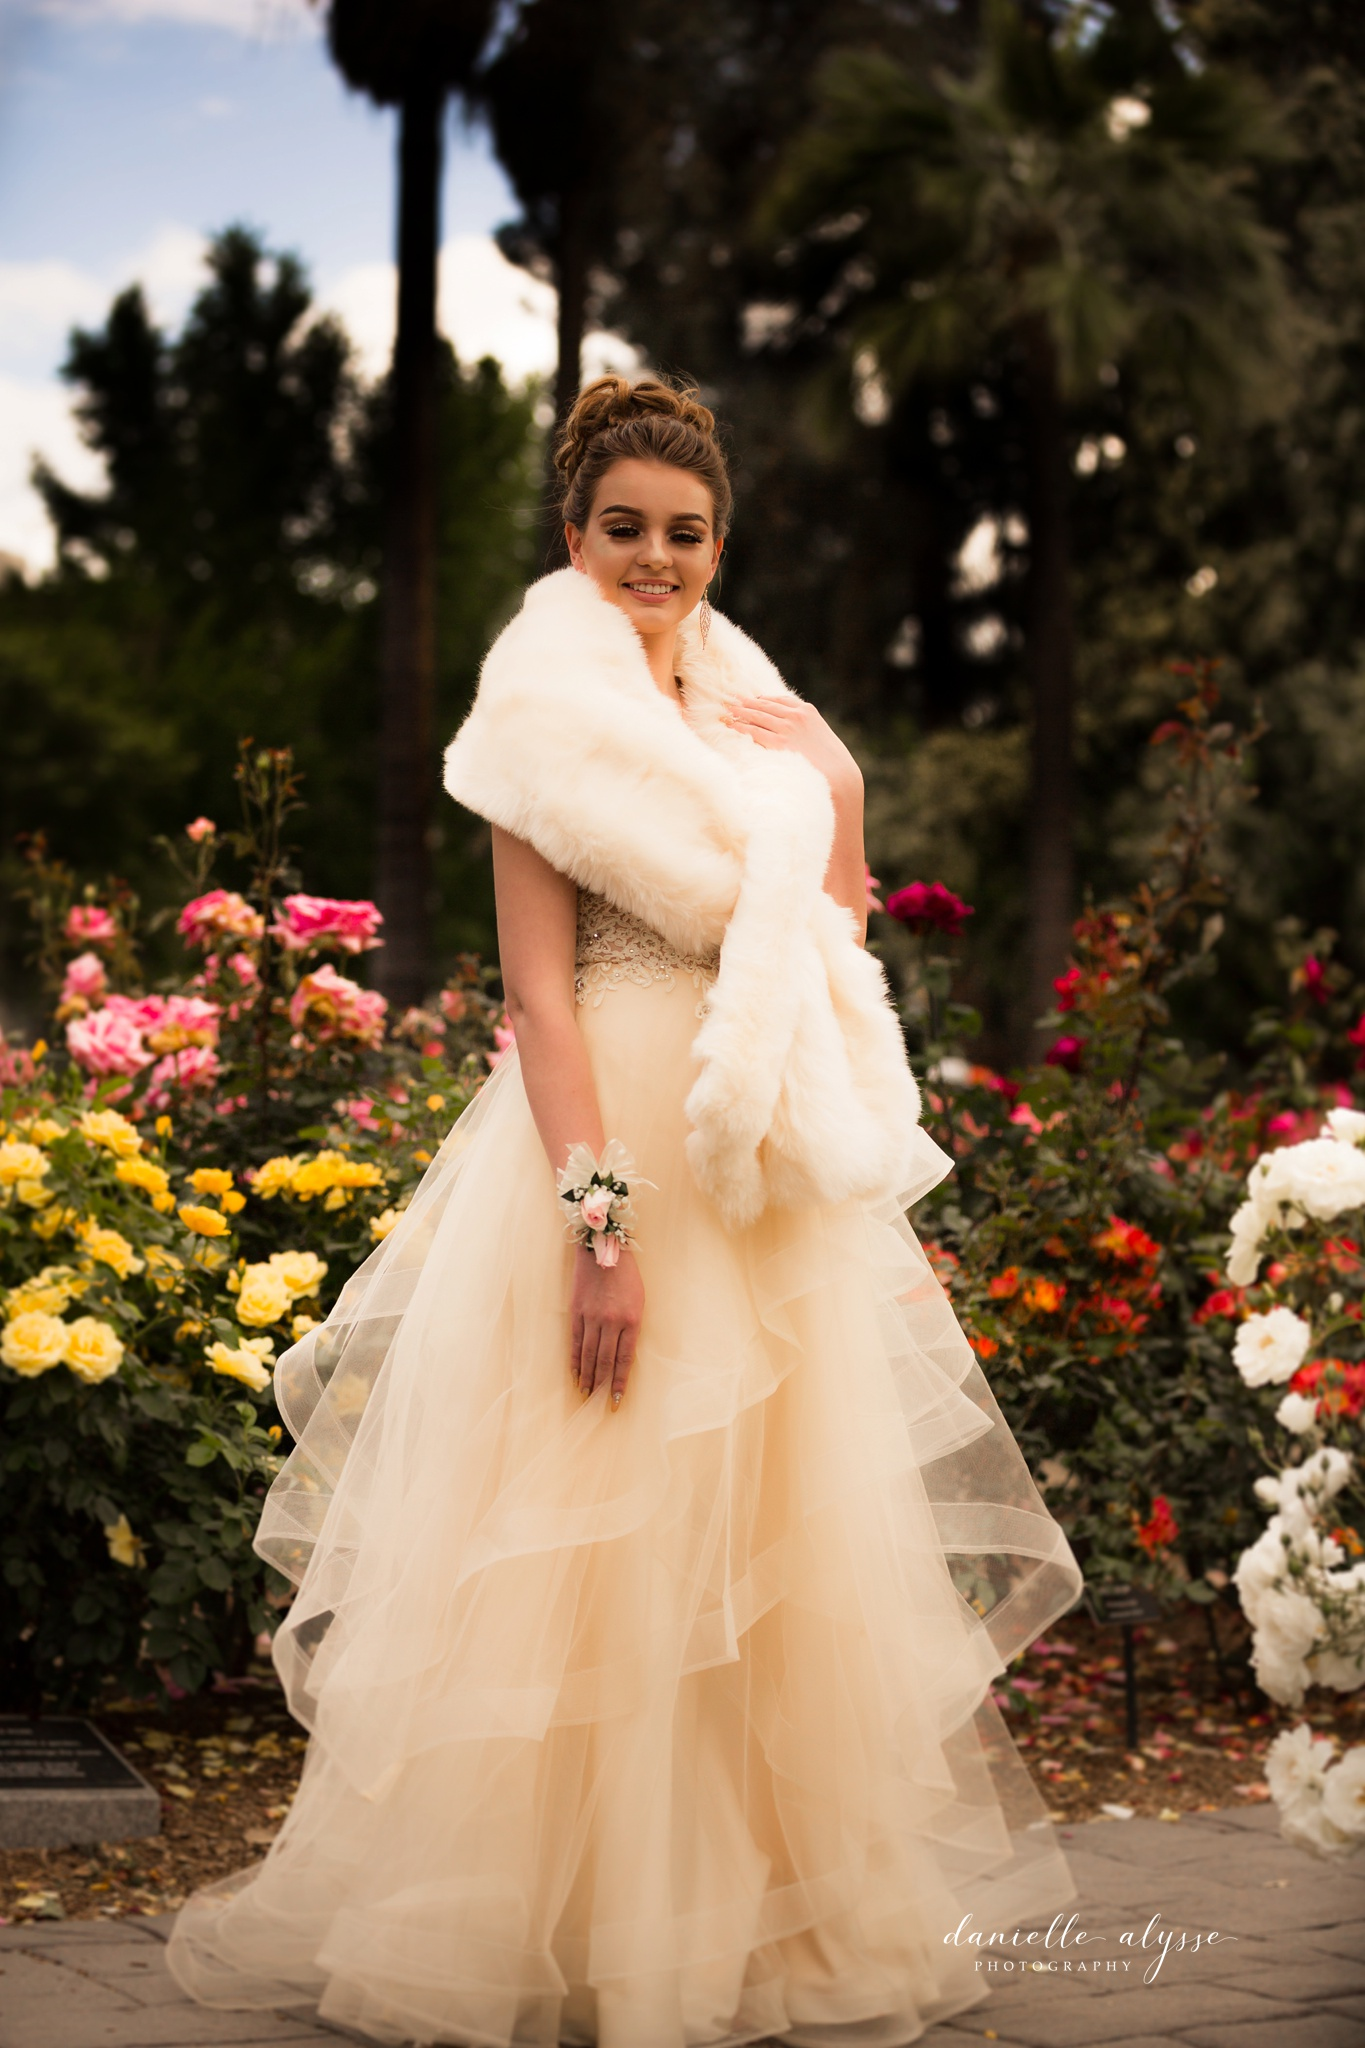 180428_prom_senior_ball_capitol_rose_danielle_alysse_photography_sacramento_photographer_blog_32_WEB.jpg